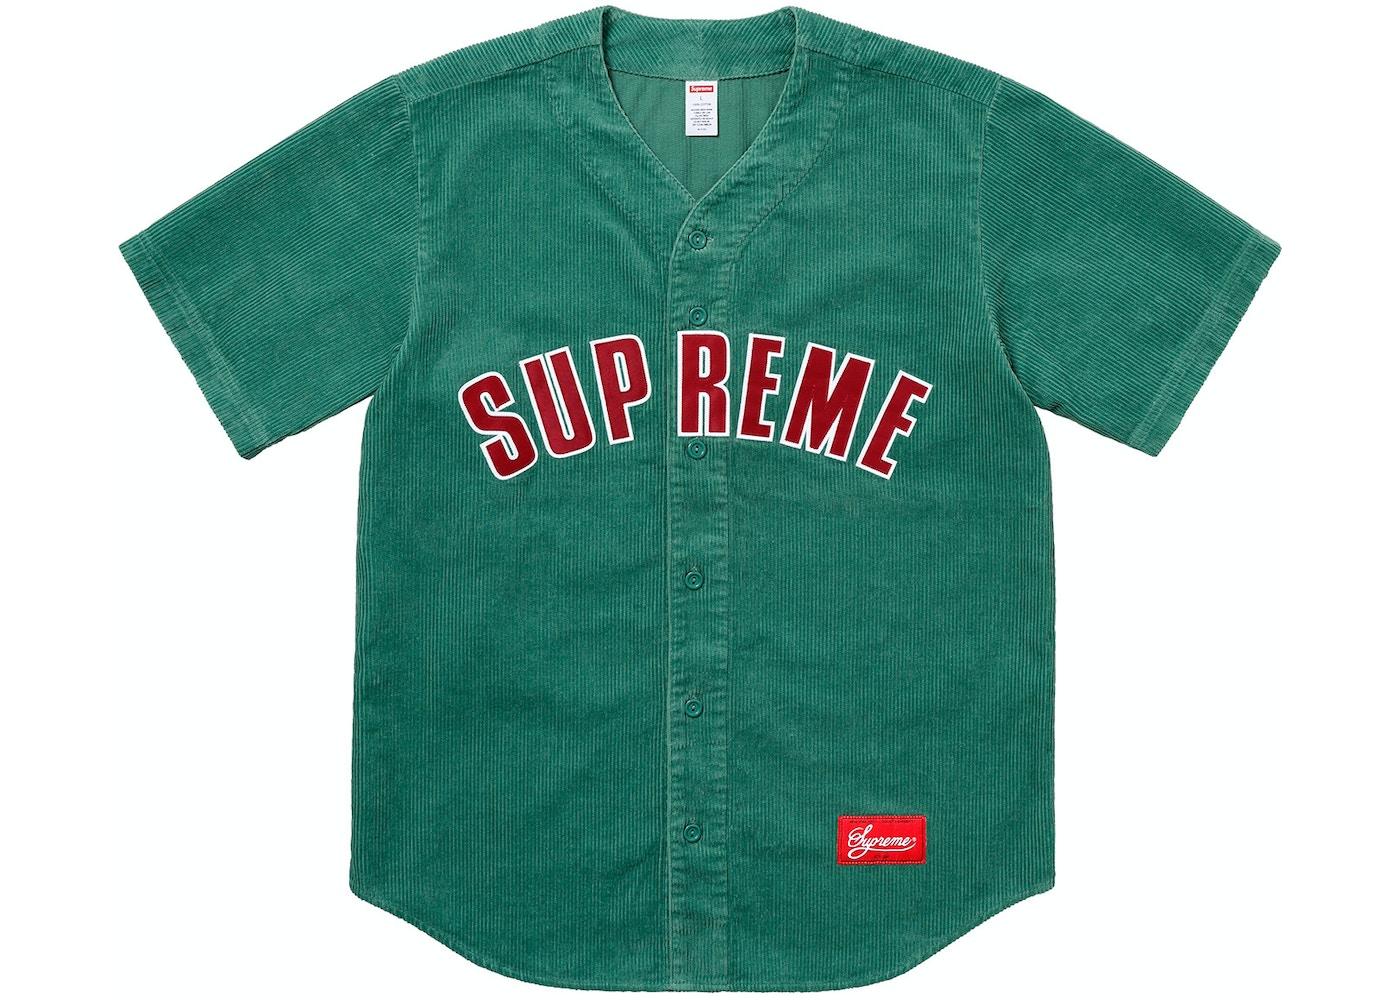 online retailer 65094 da31c Supreme Corduroy Baseball Jersey Dusty Teal - SS18